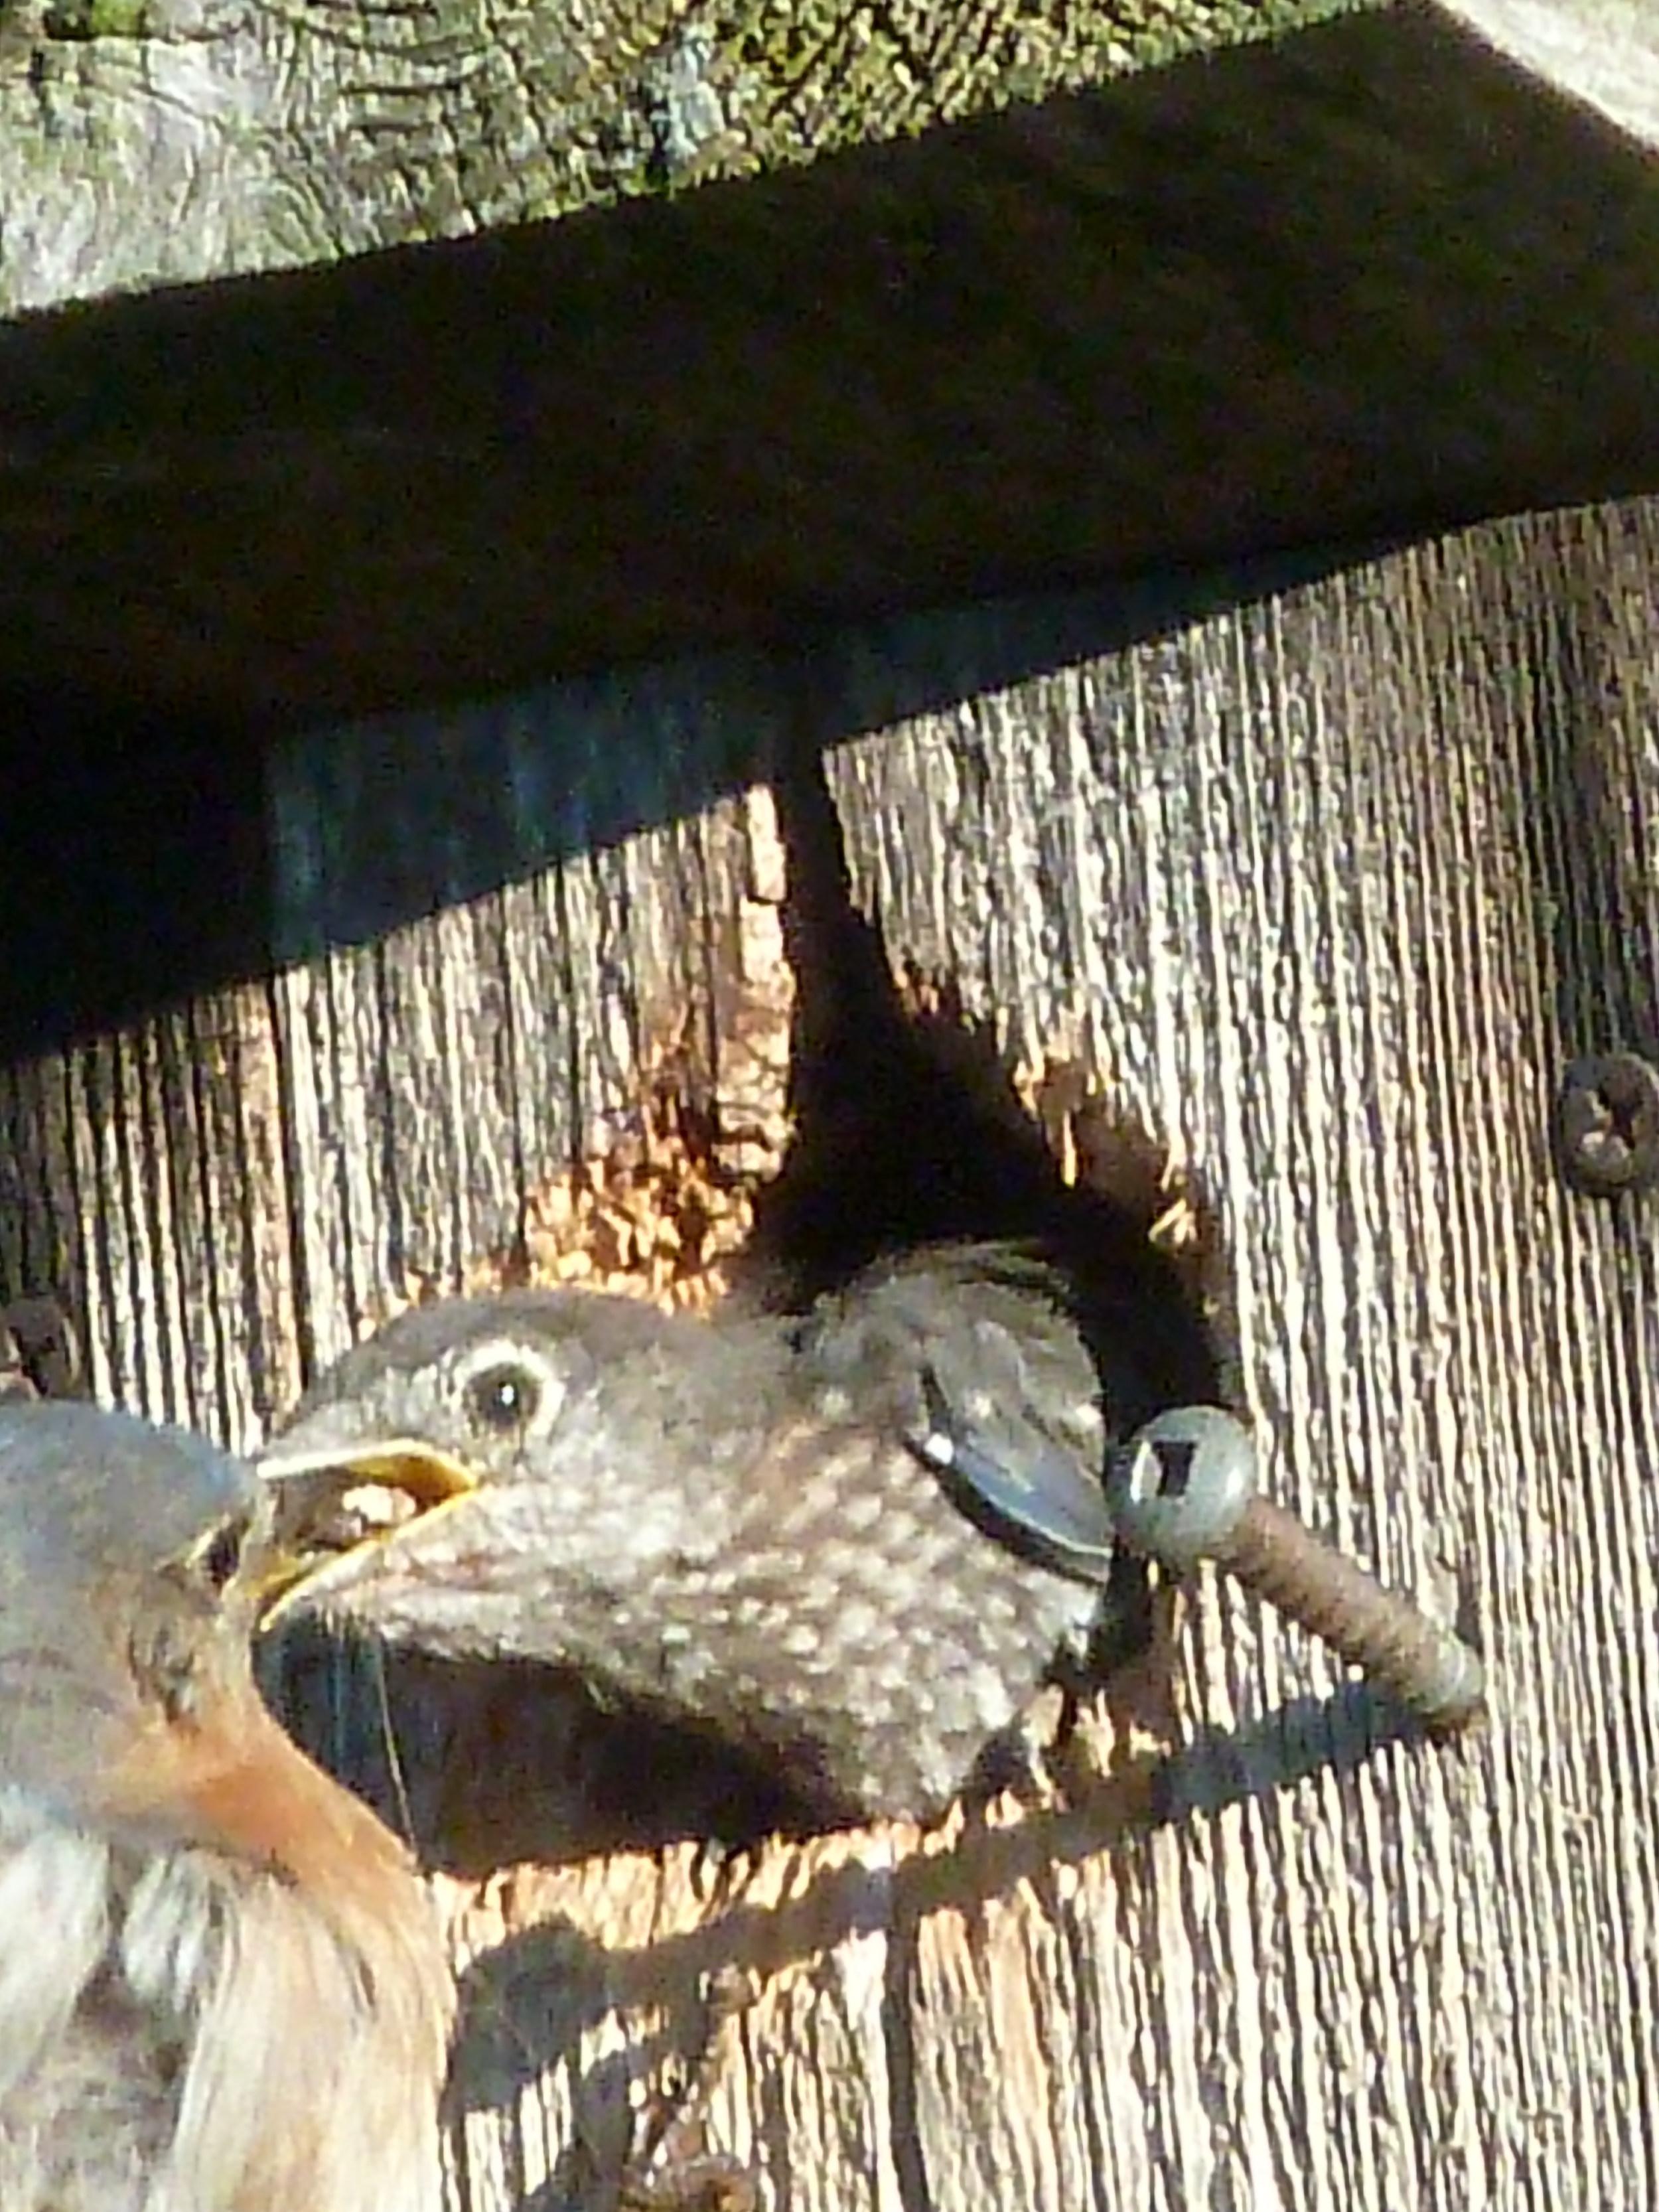 Feeding time in the Eastern Bluebird house!!